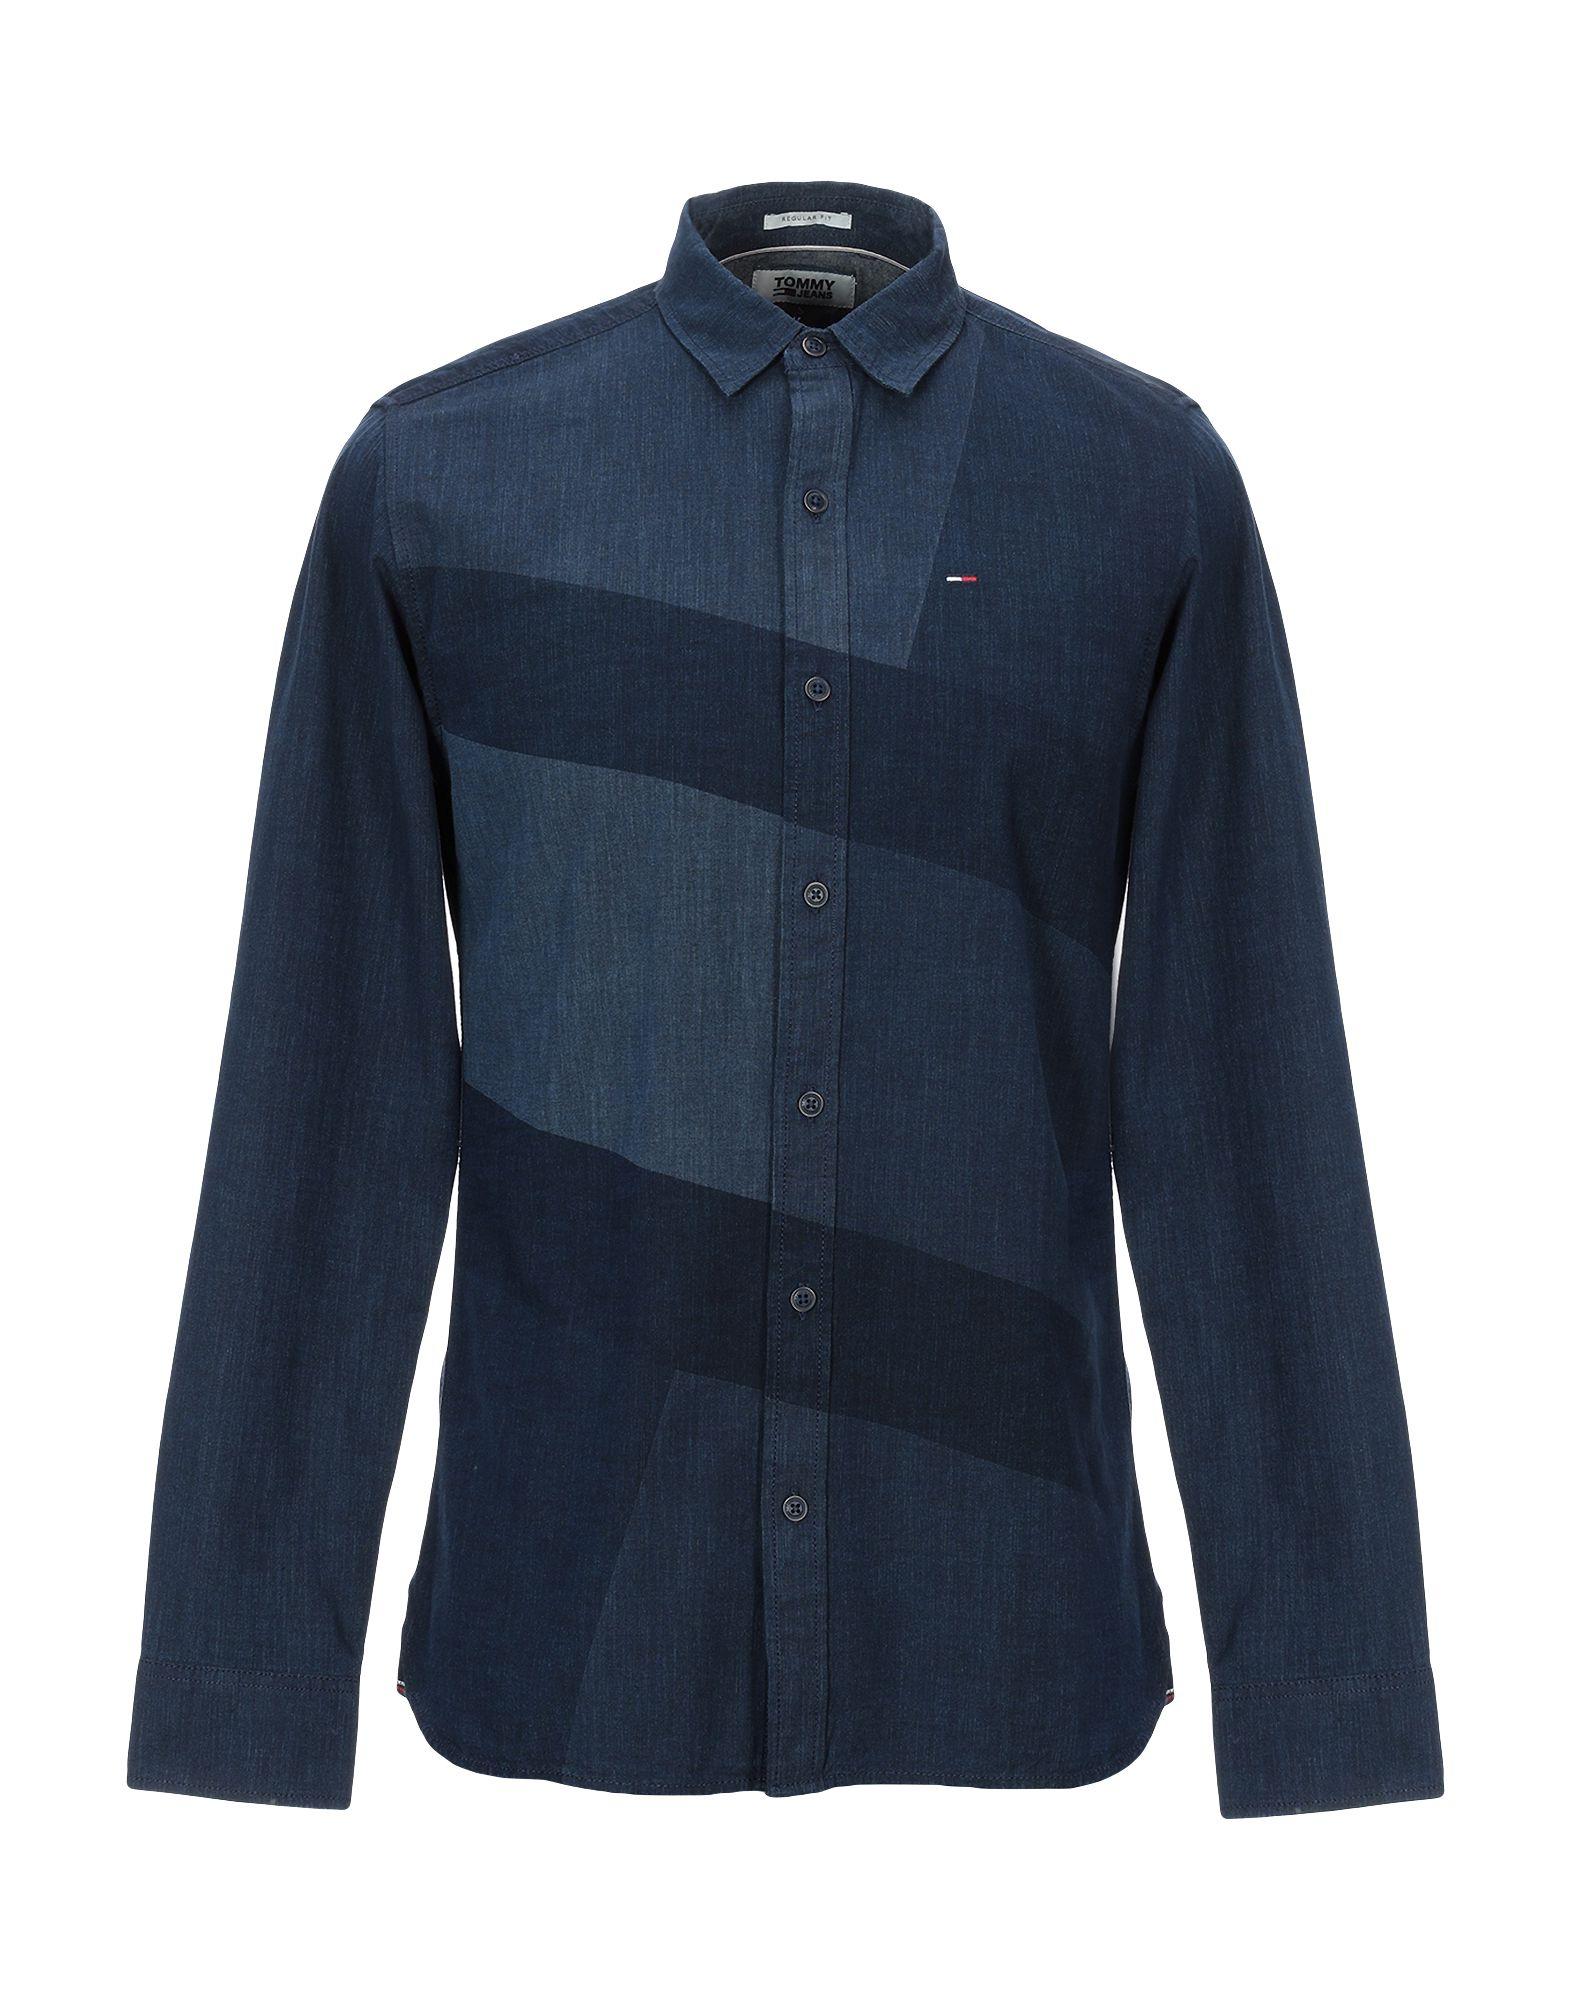 Фото - TOMMY JEANS Джинсовая рубашка рубашка джинсовая tommy jeans tommy jeans to013emyzs77